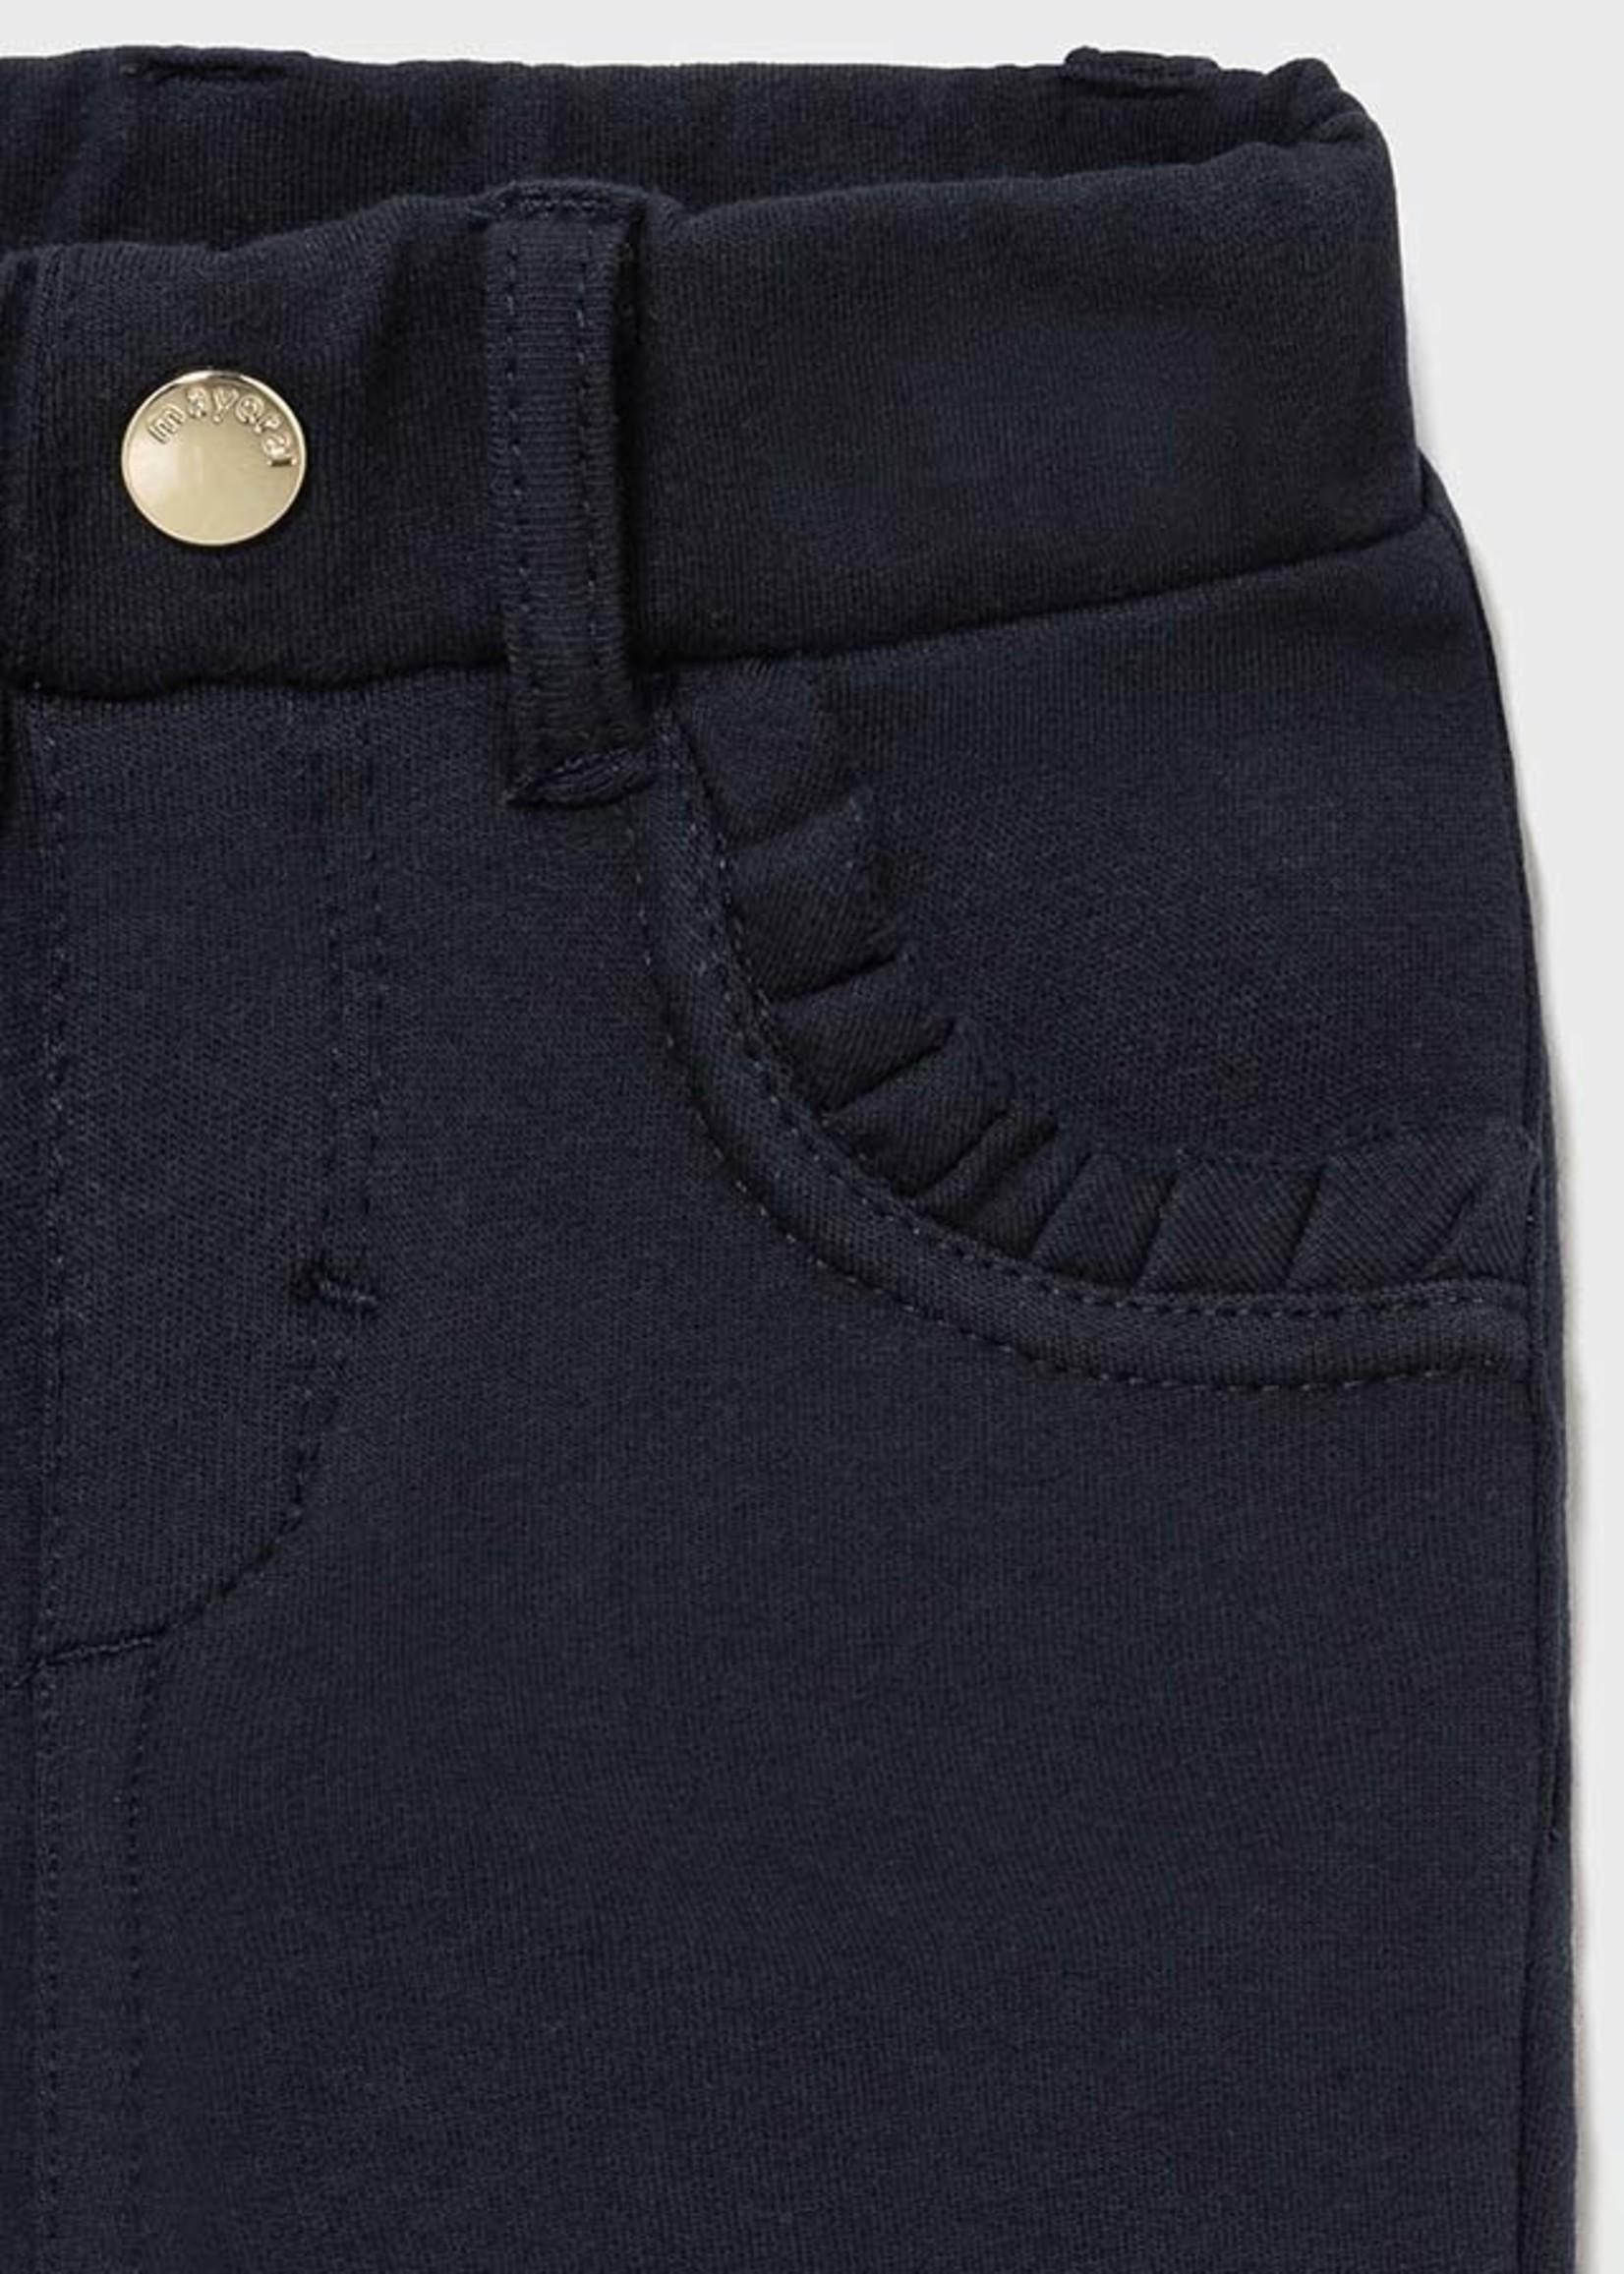 Mayoral Mayoral fleece basic trousers navy